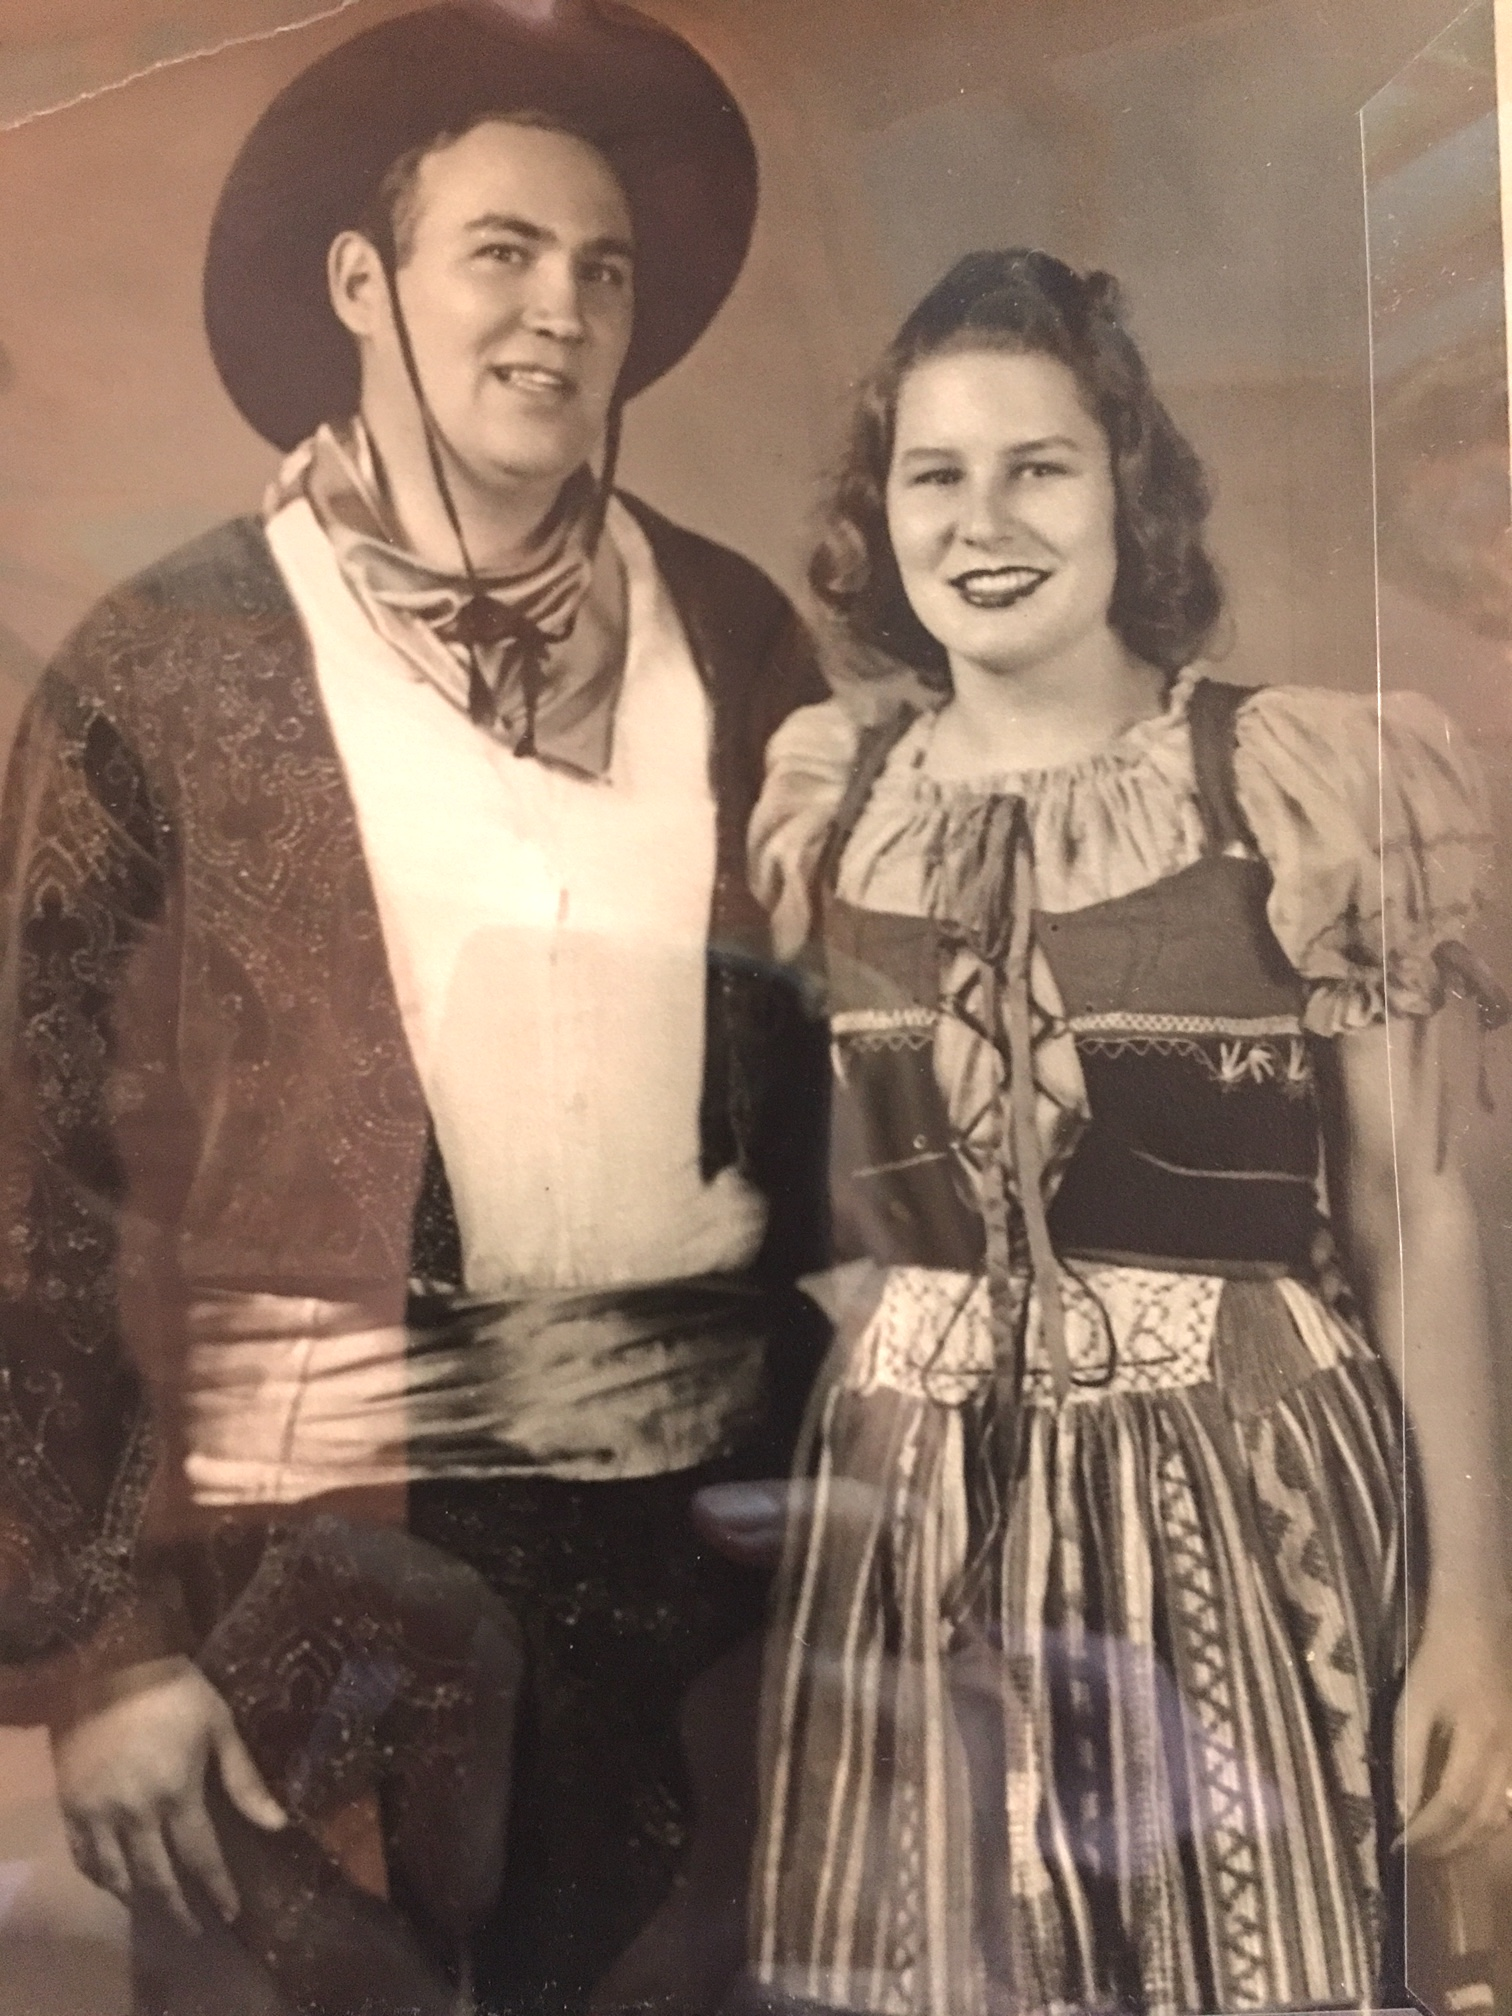 My parents in costume